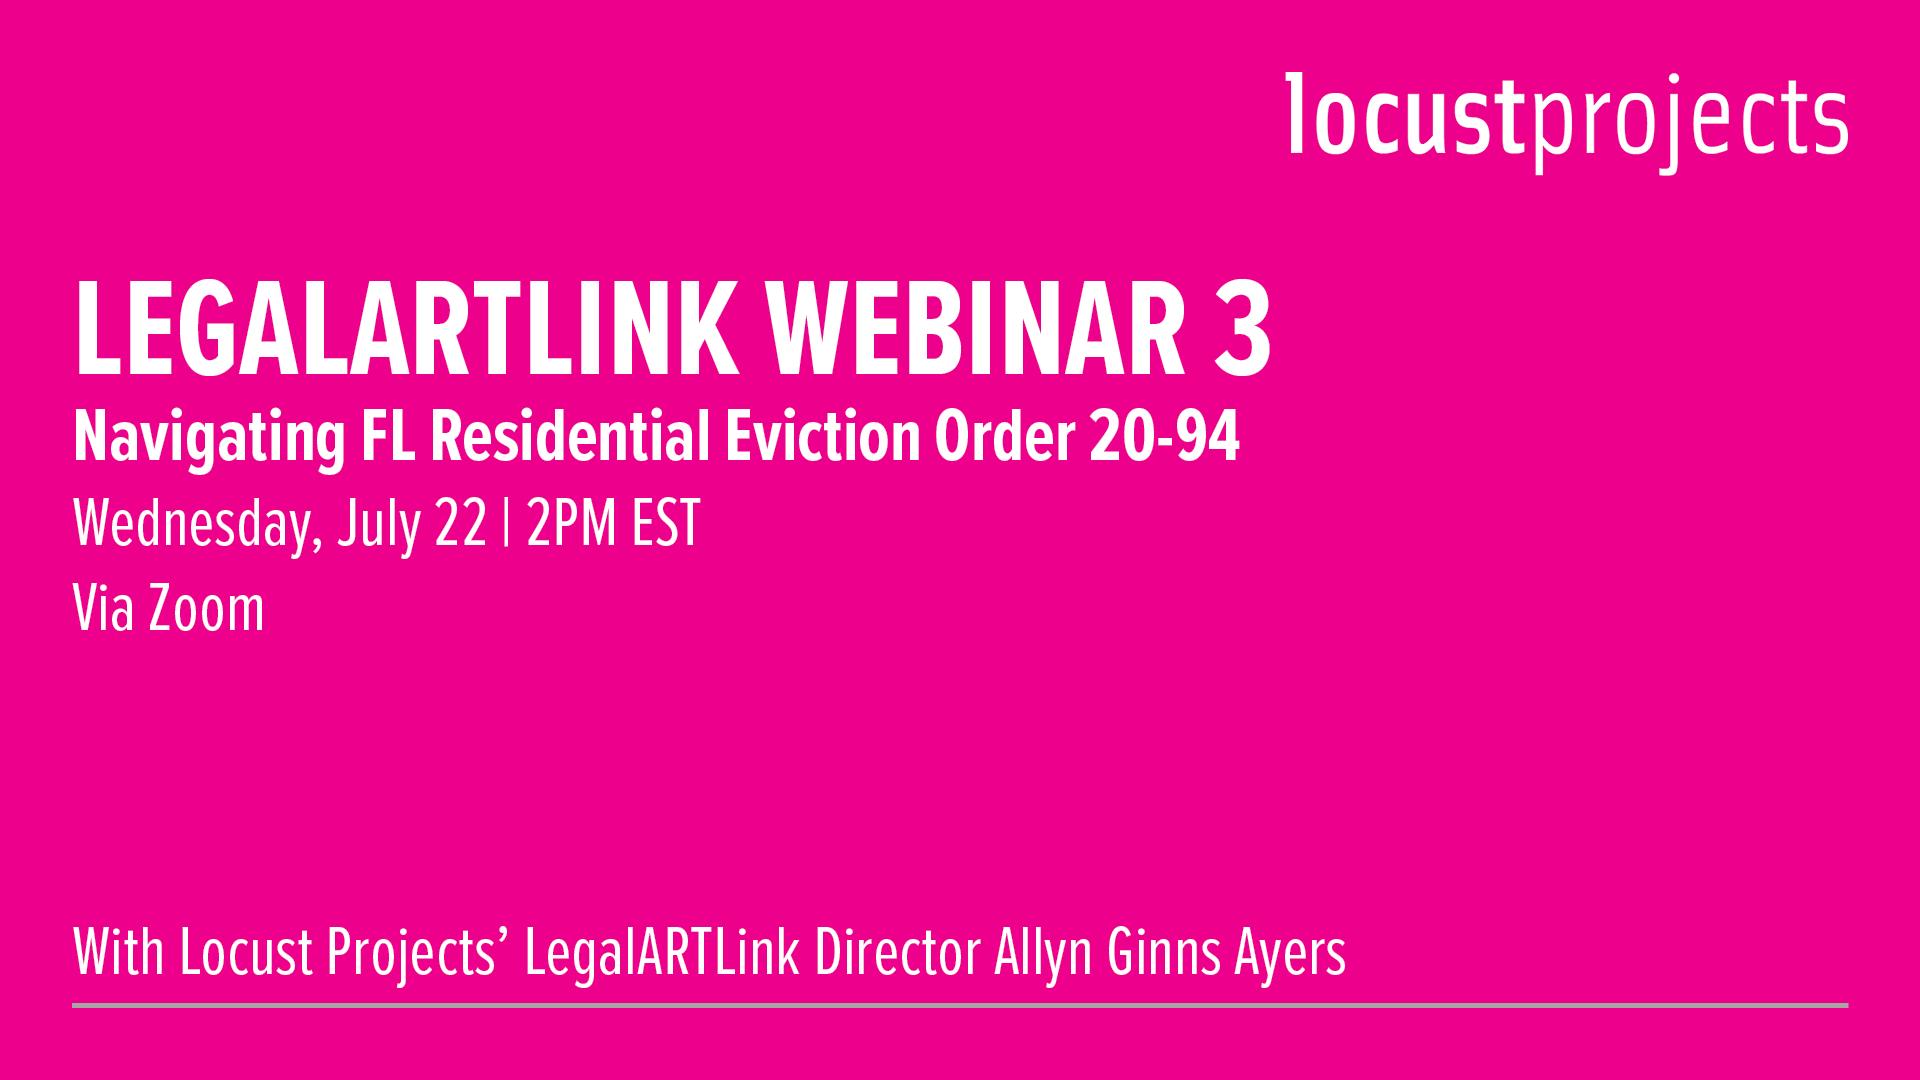 LegalARTLink Webinar 3